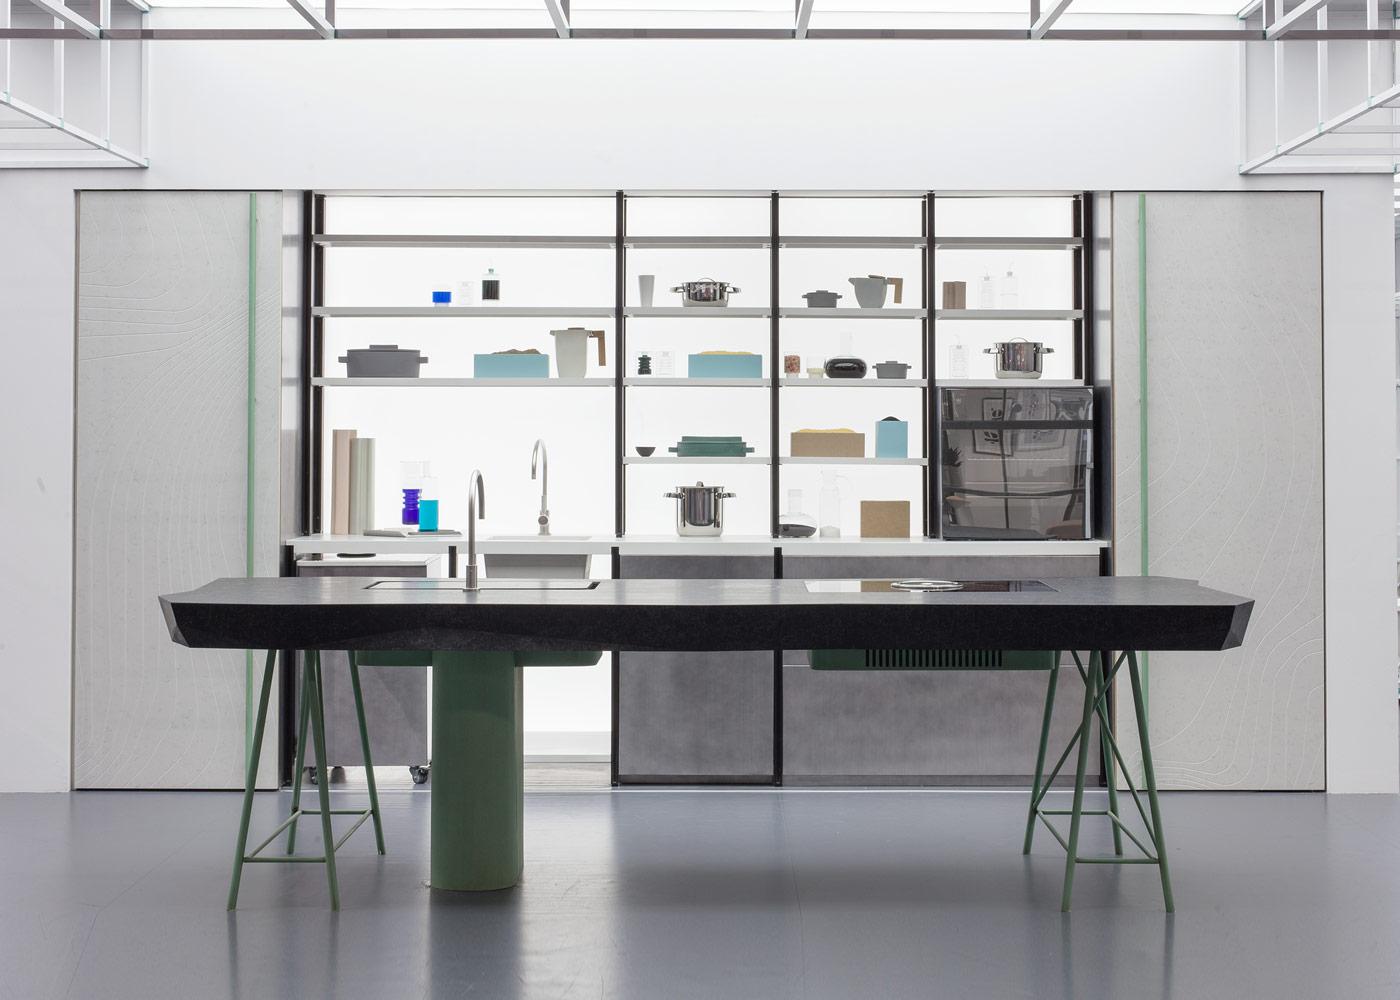 tipic_offmat_tuler_responsive-kitchen